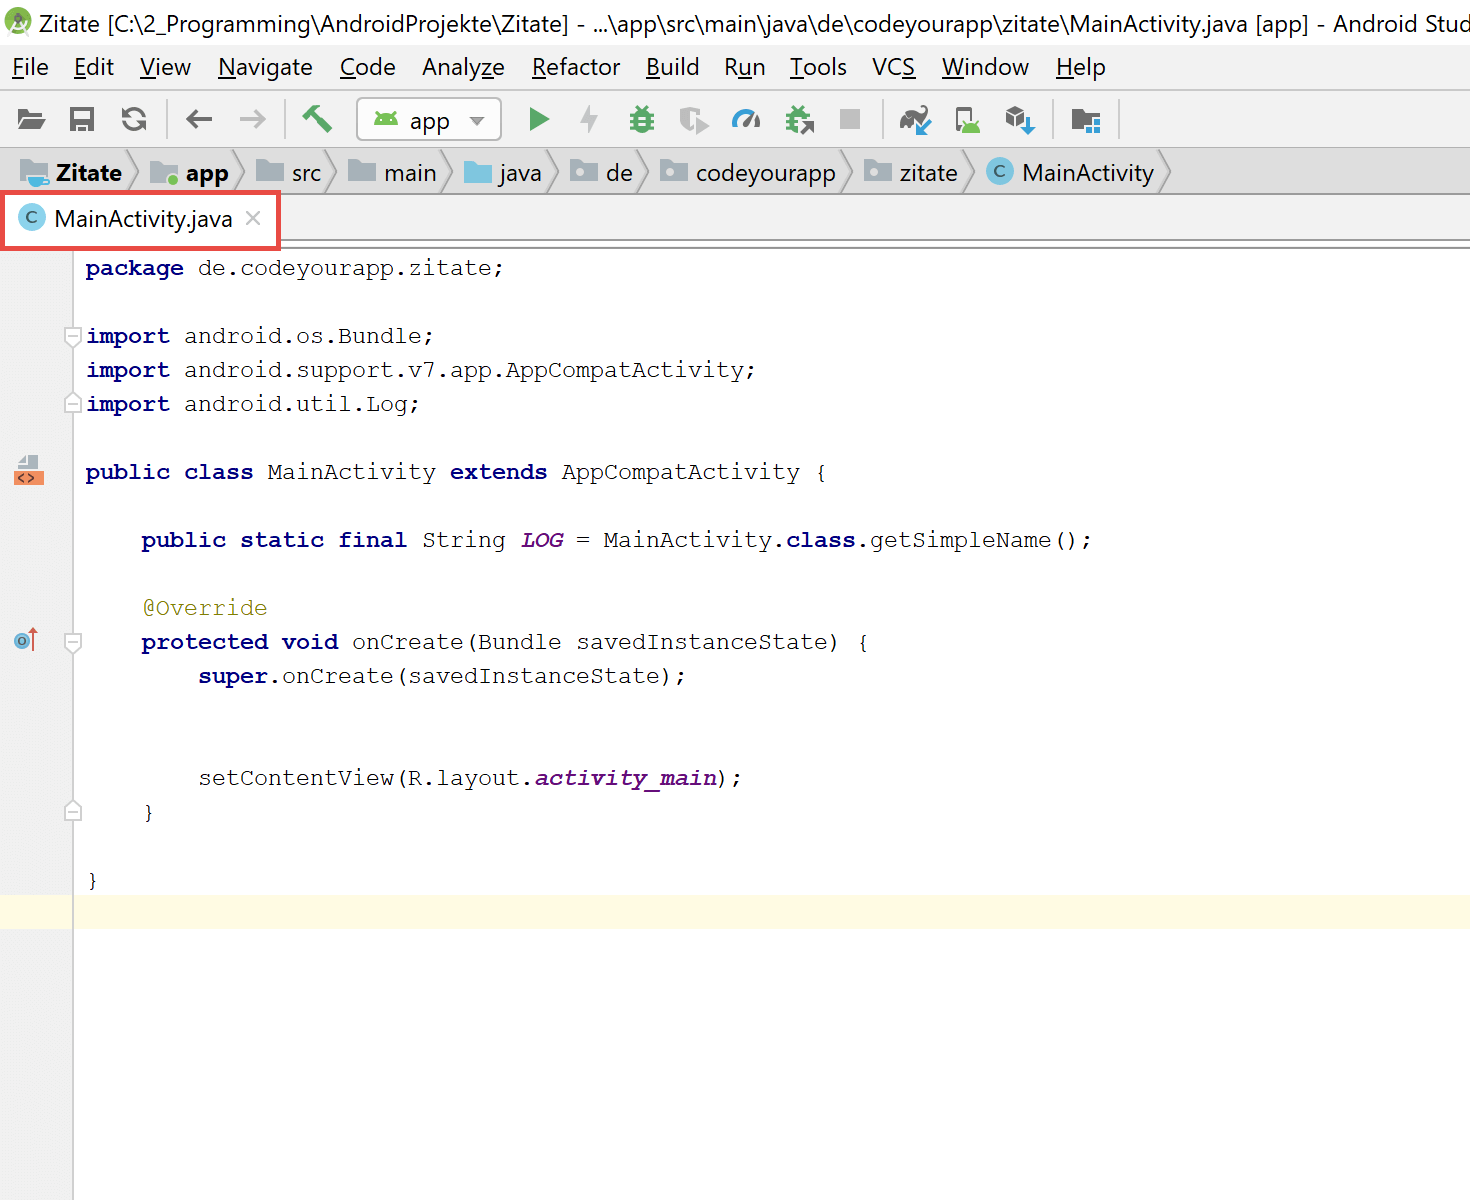 listview_code_start